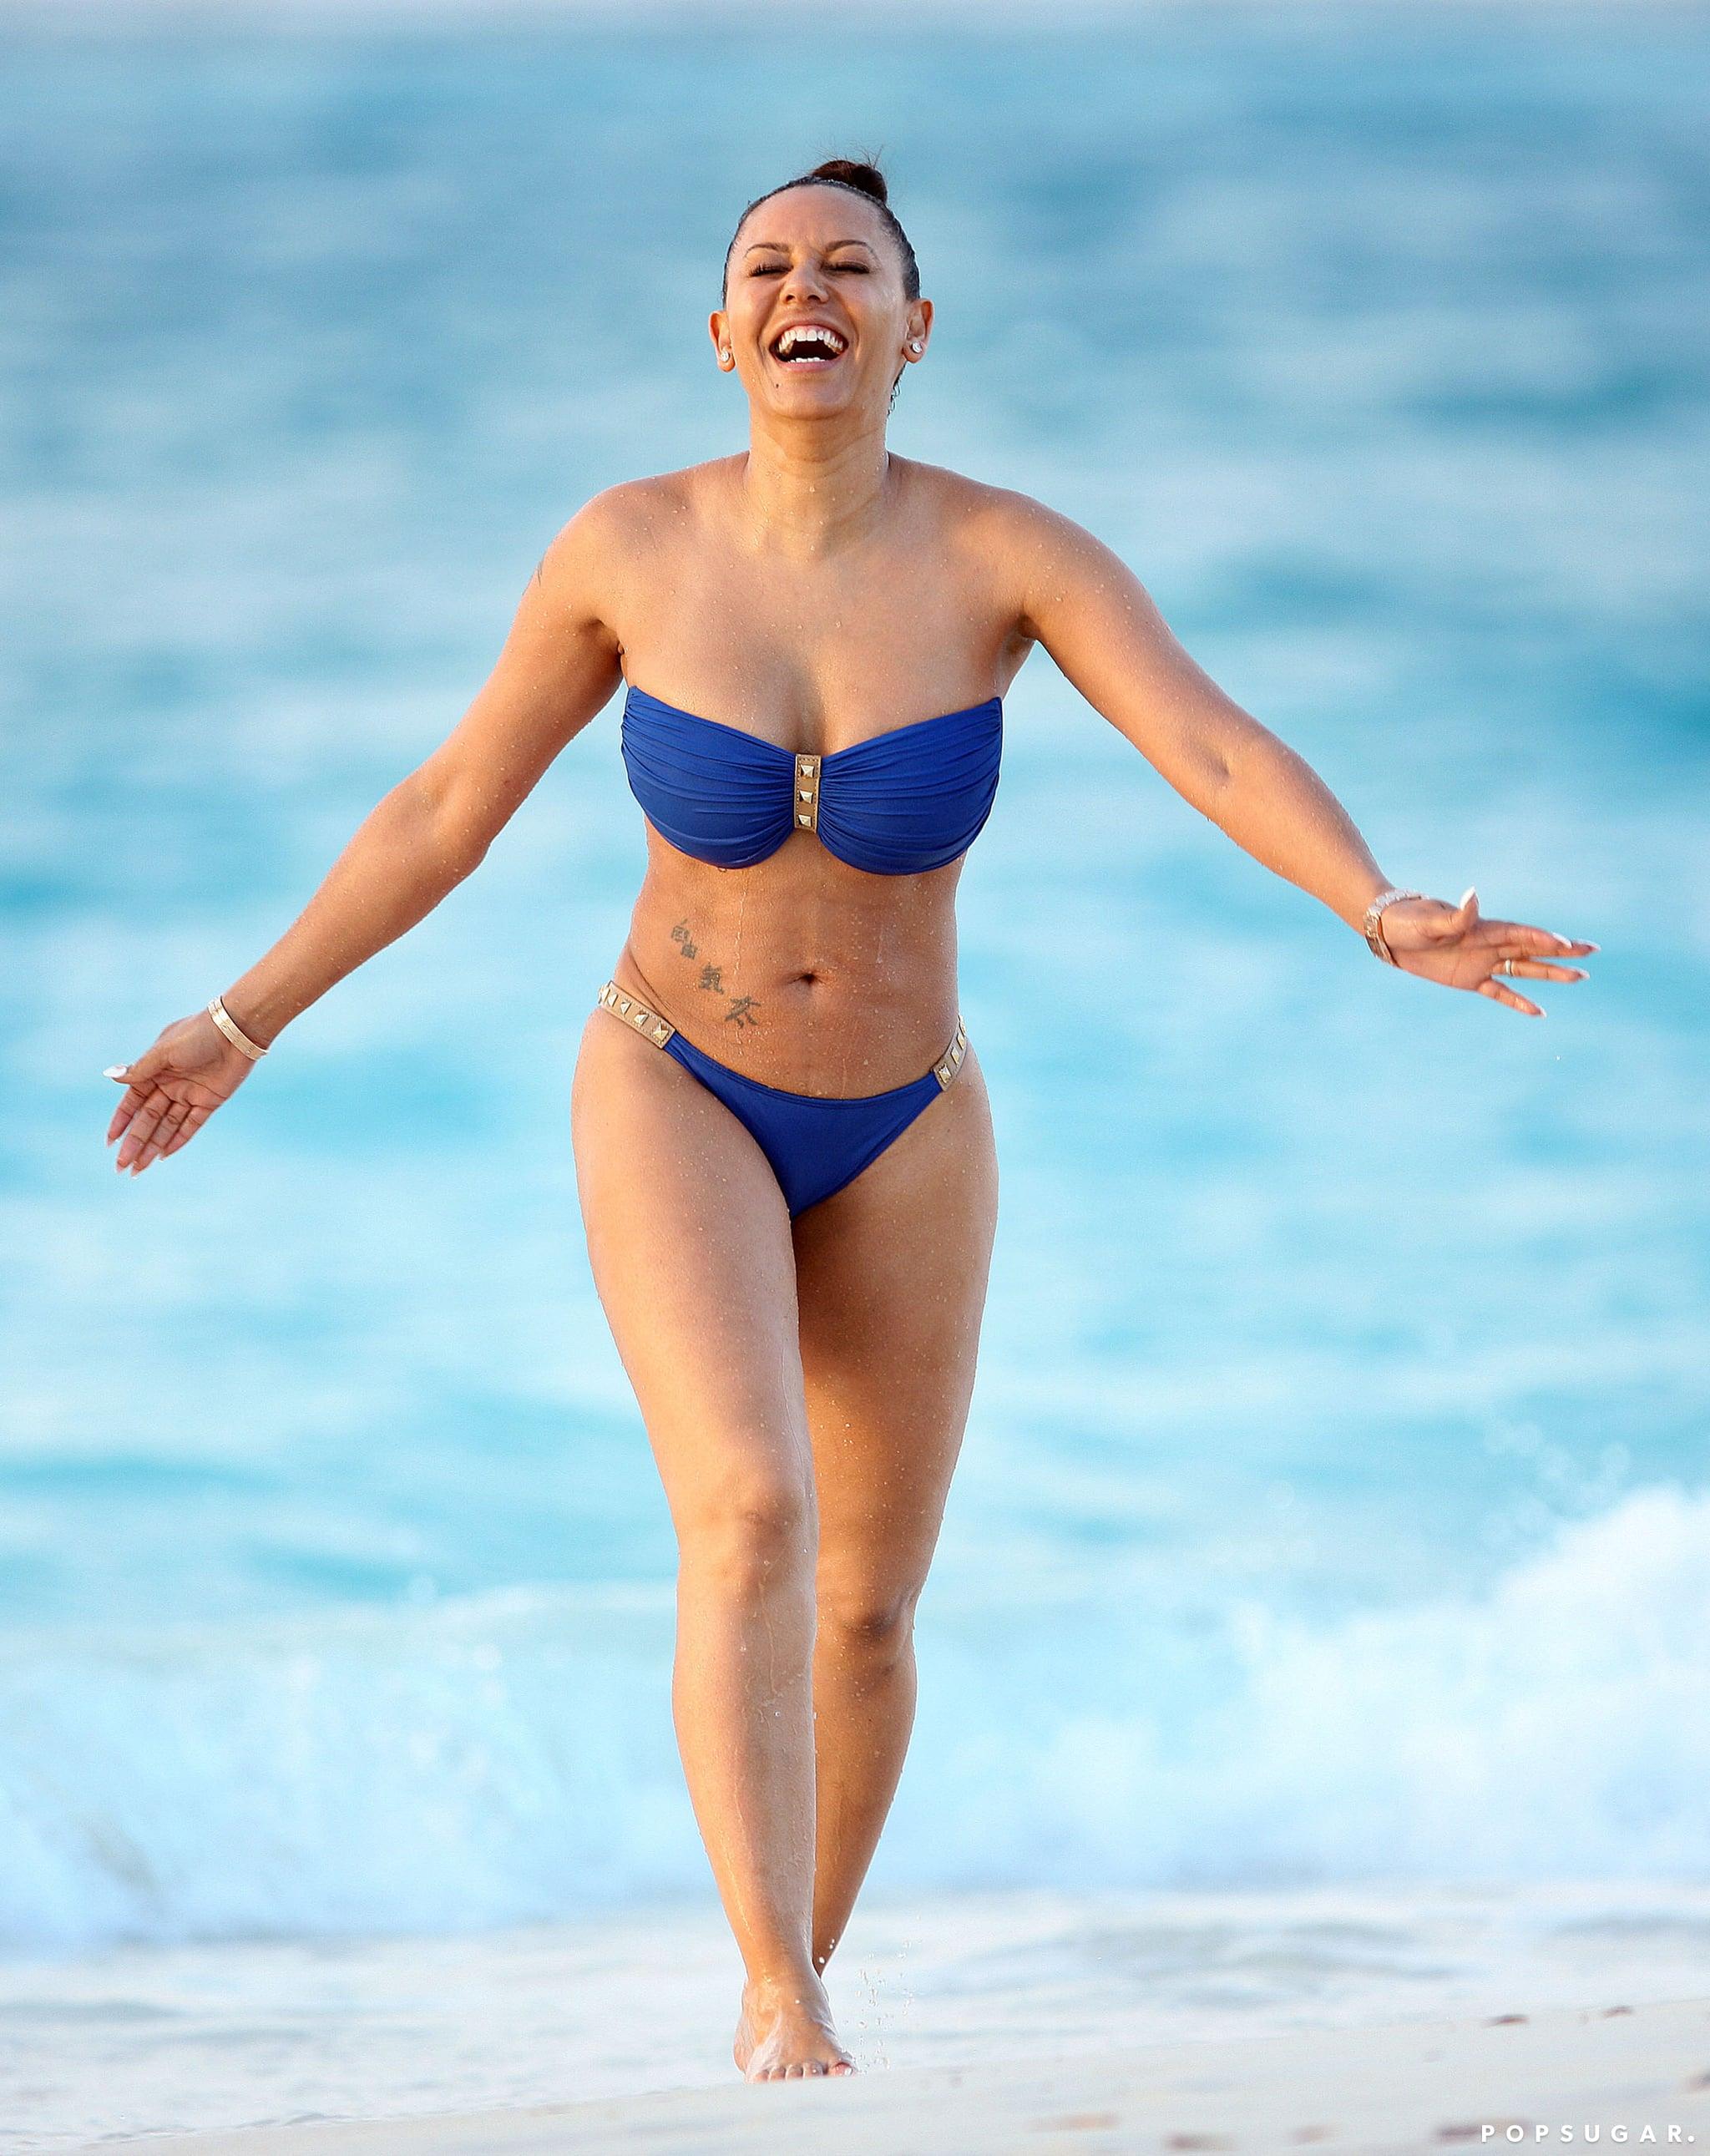 Mature Amature Swimsuit Pictures 42